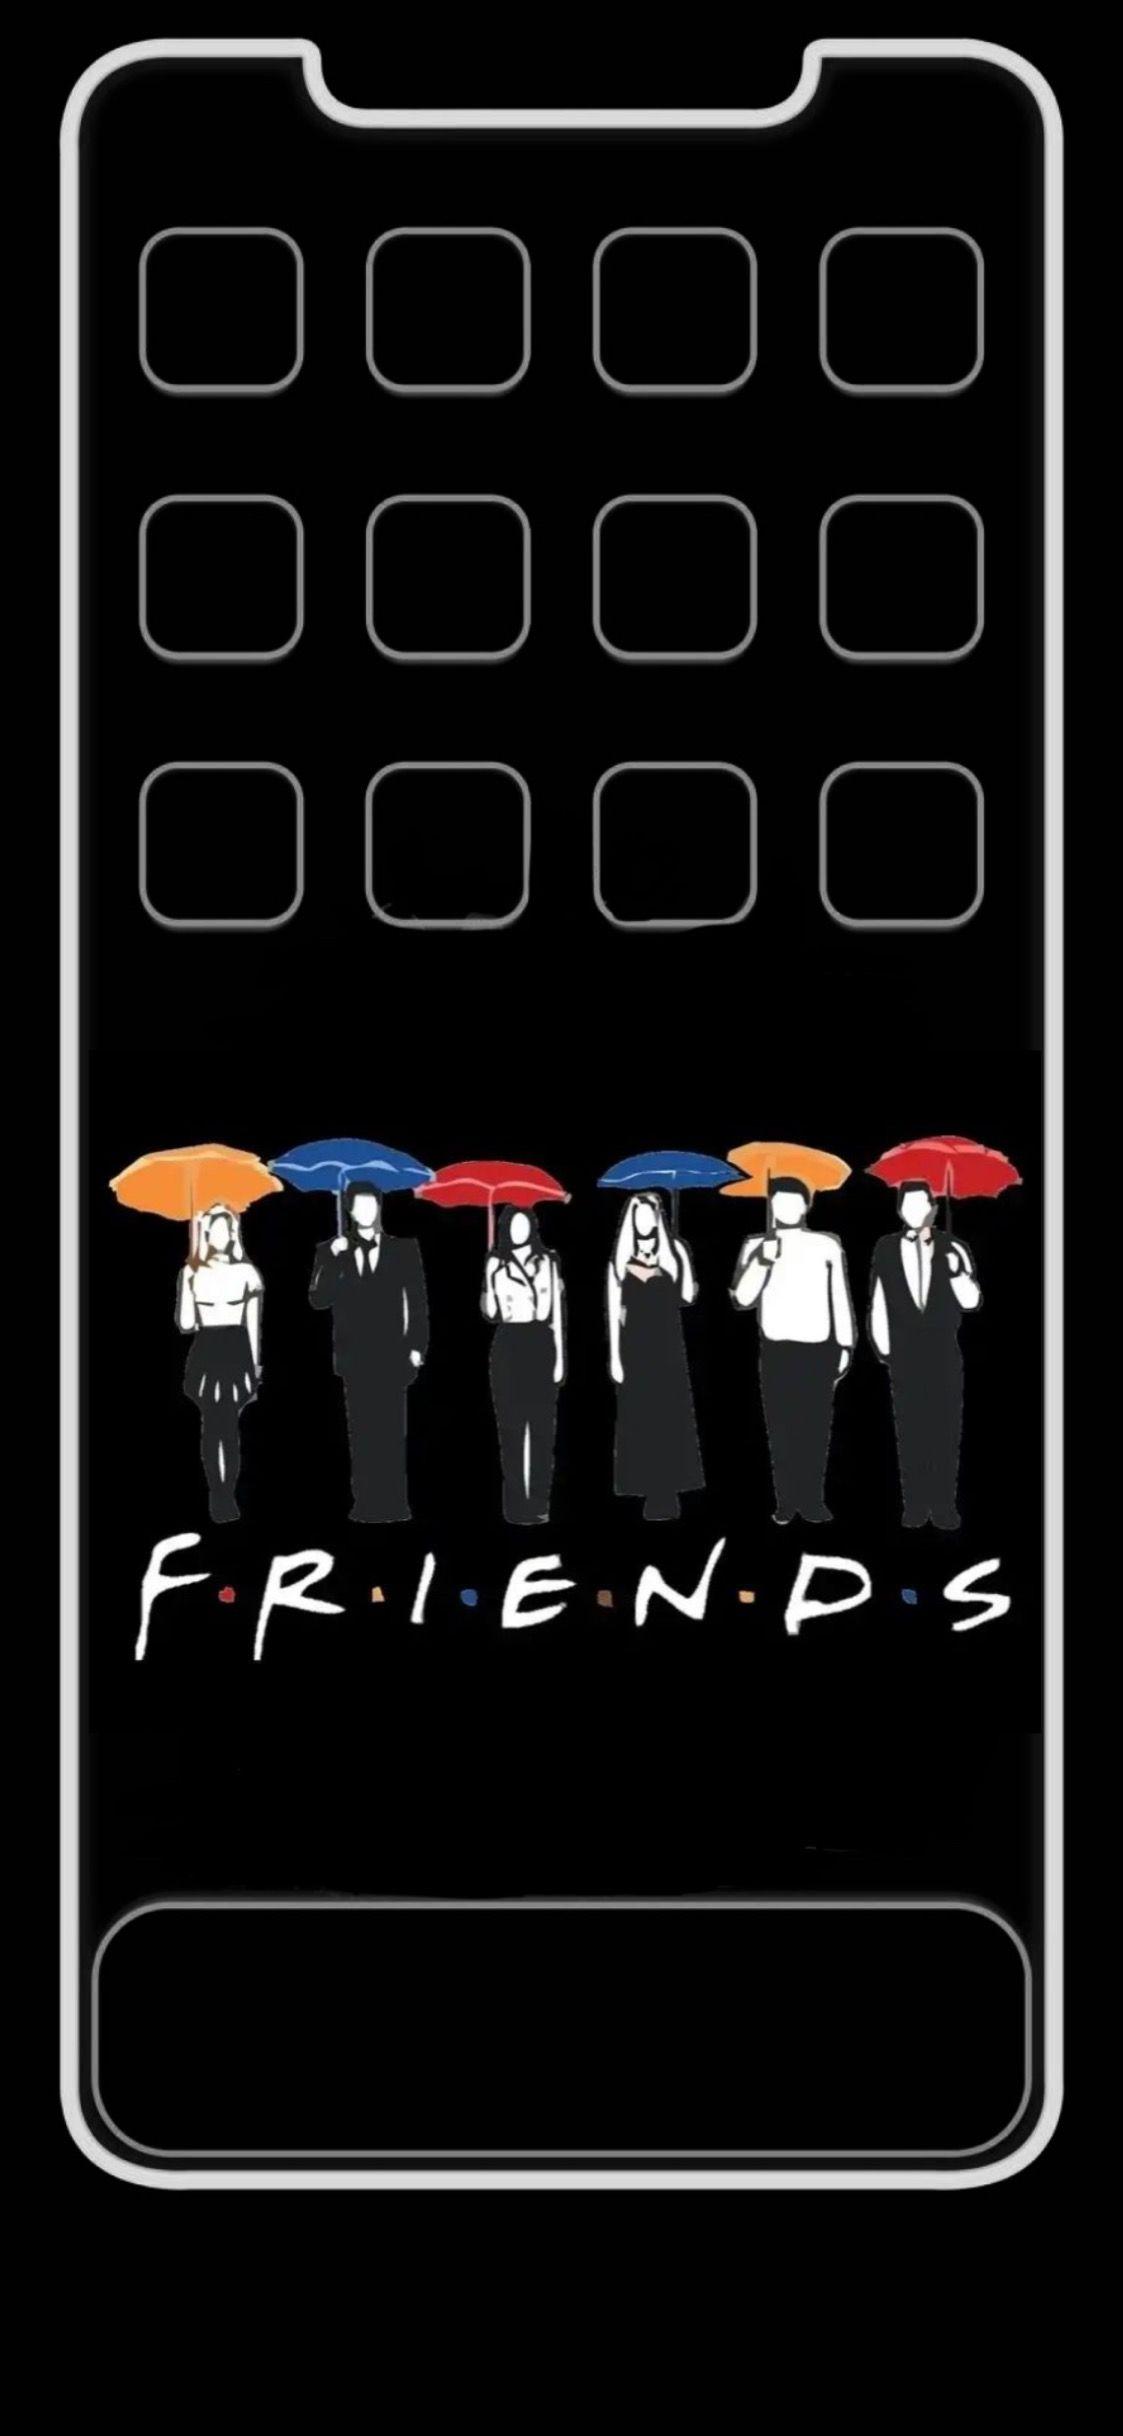 Iphone Xs Max Wallpaper Friends Tv Show Friends Tv Show Wallpaper Friends Tv